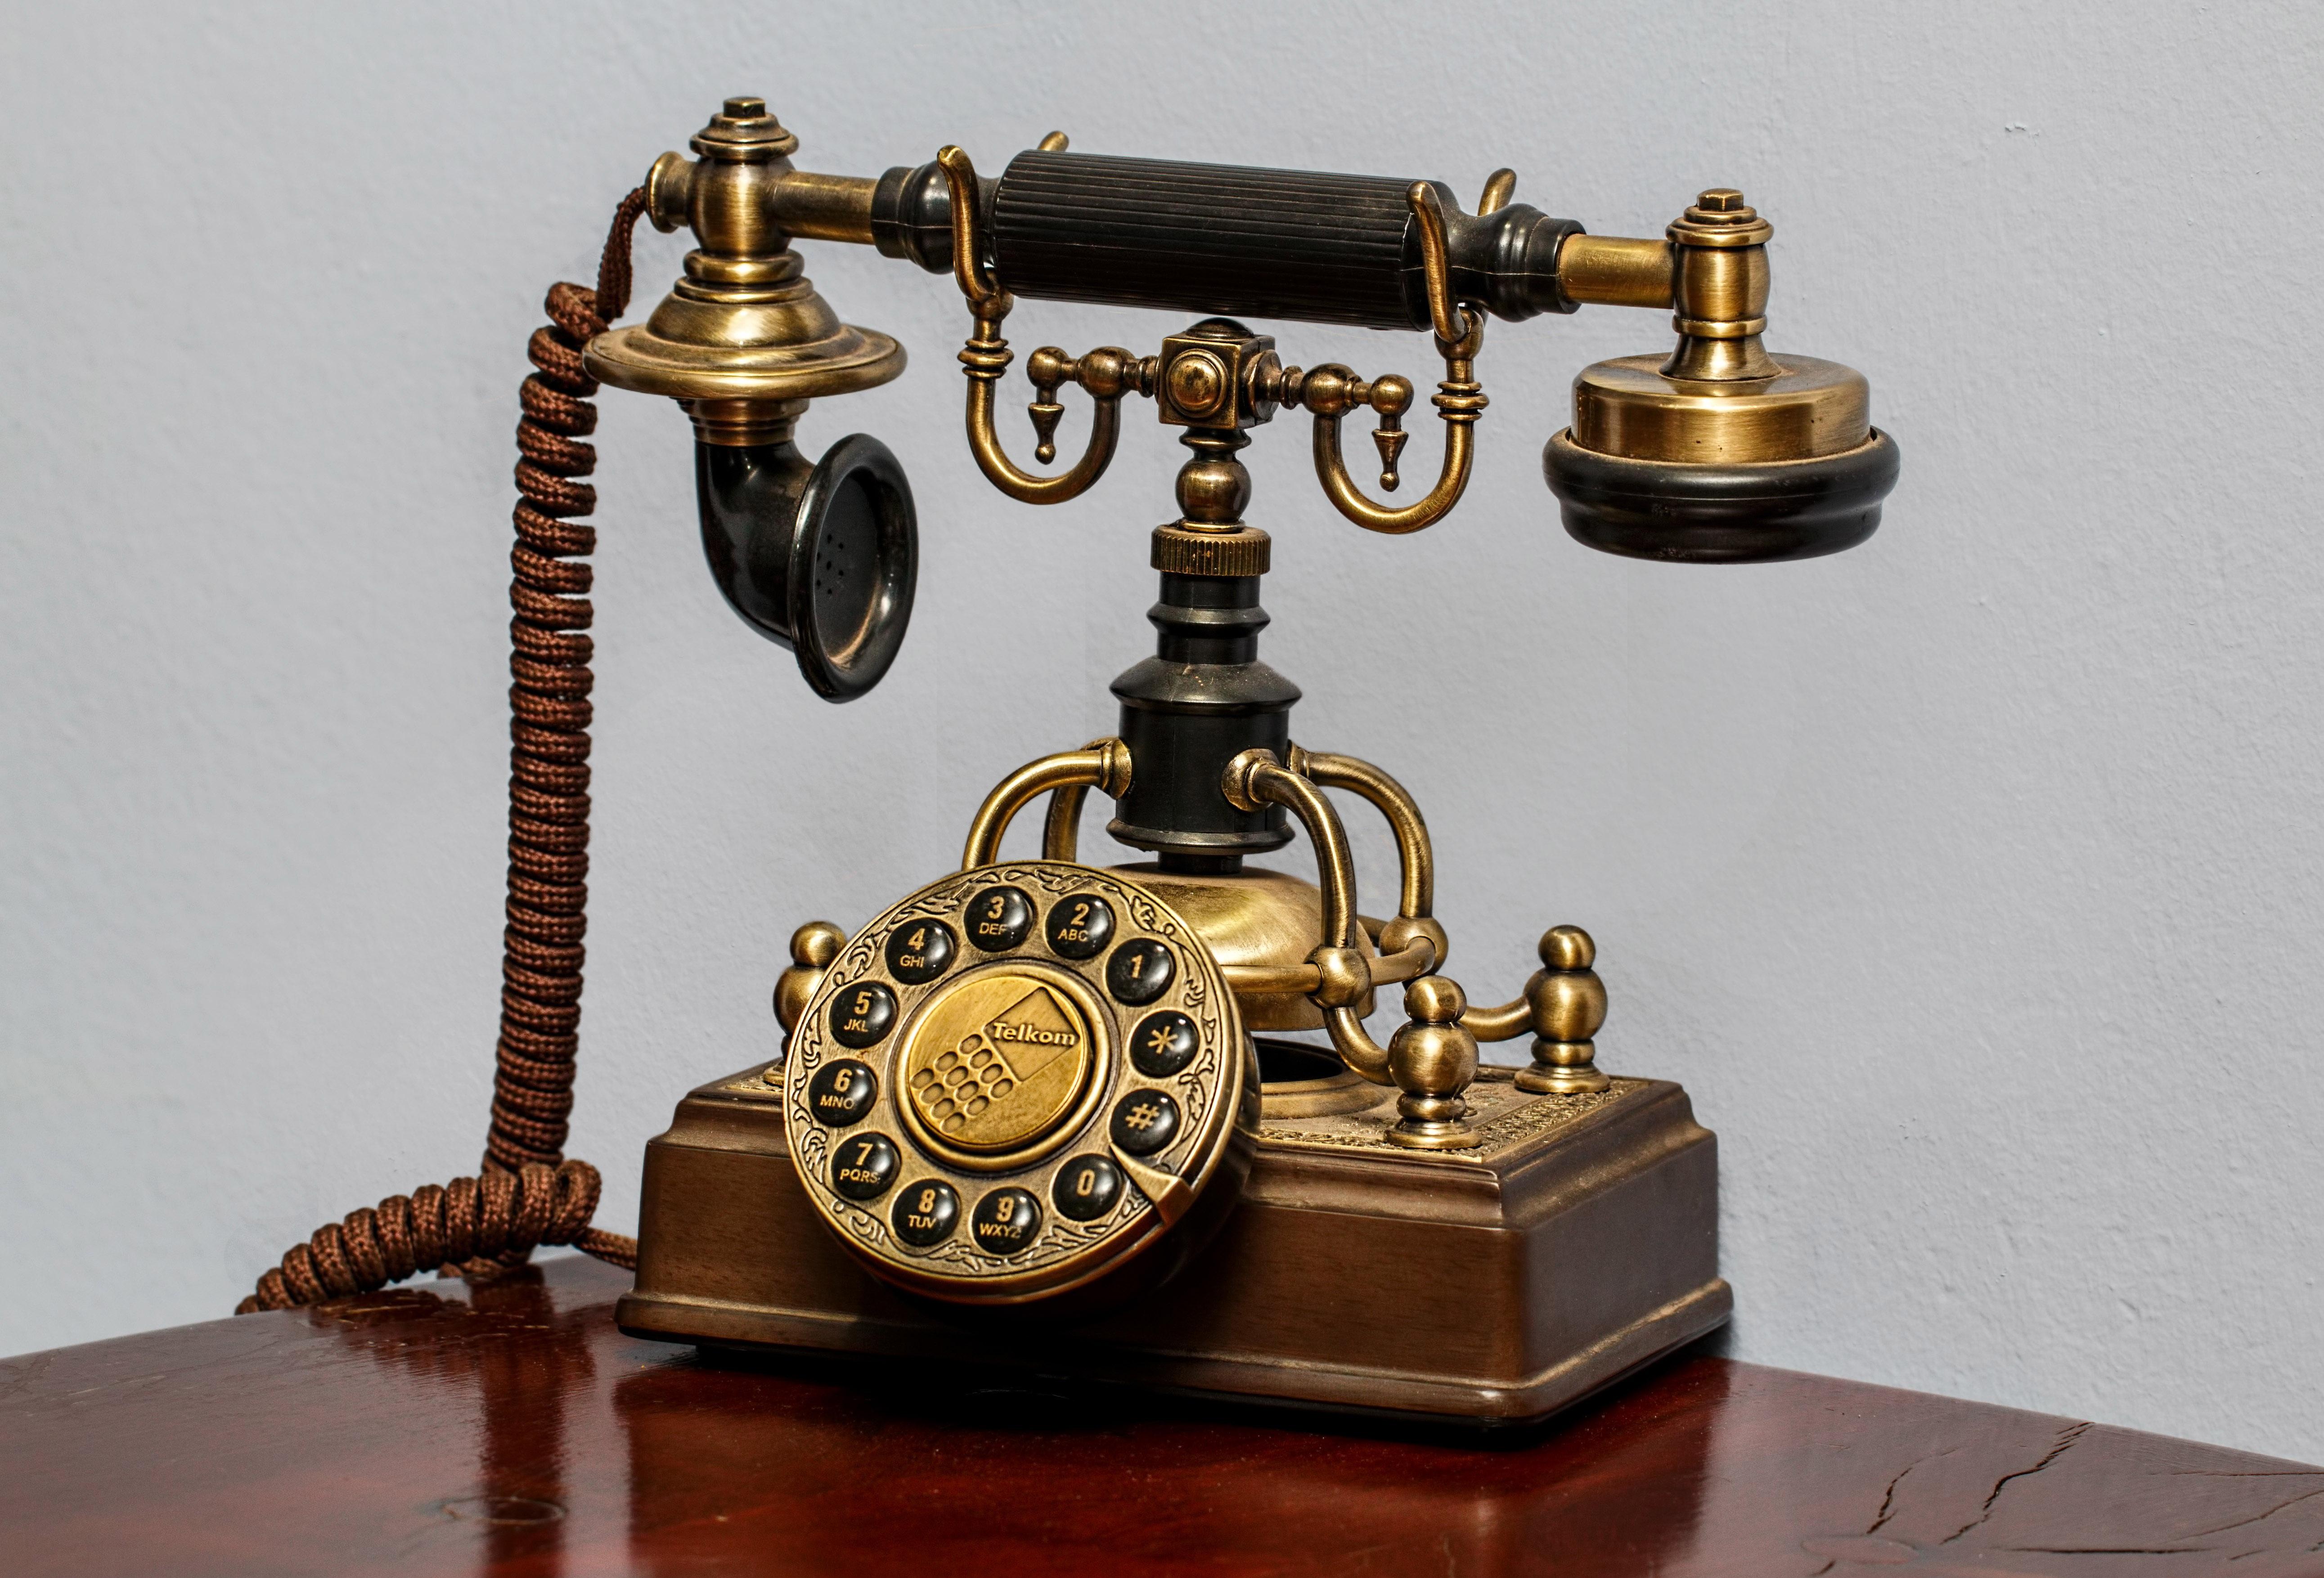 Old Style Classic Telephone image - Free stock photo - Public Domain